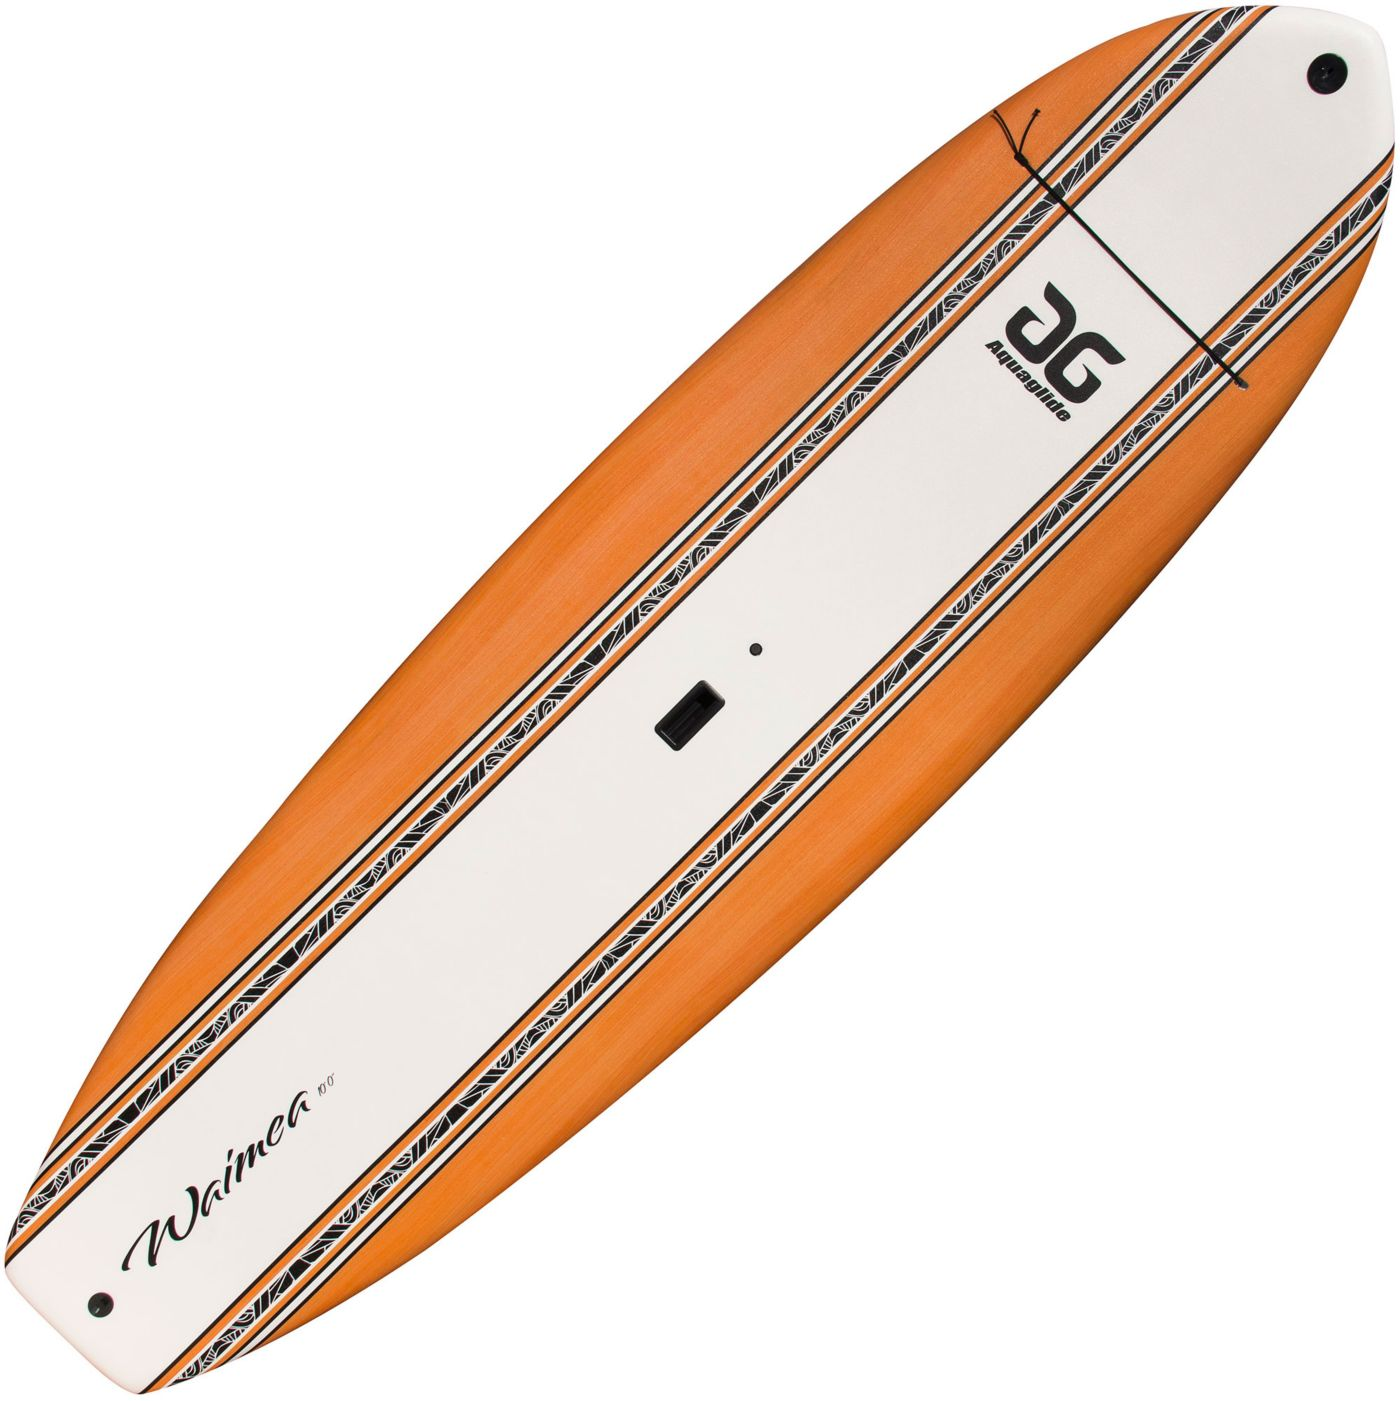 Aquaglide Waimea 10 Stand-Up Paddle Board